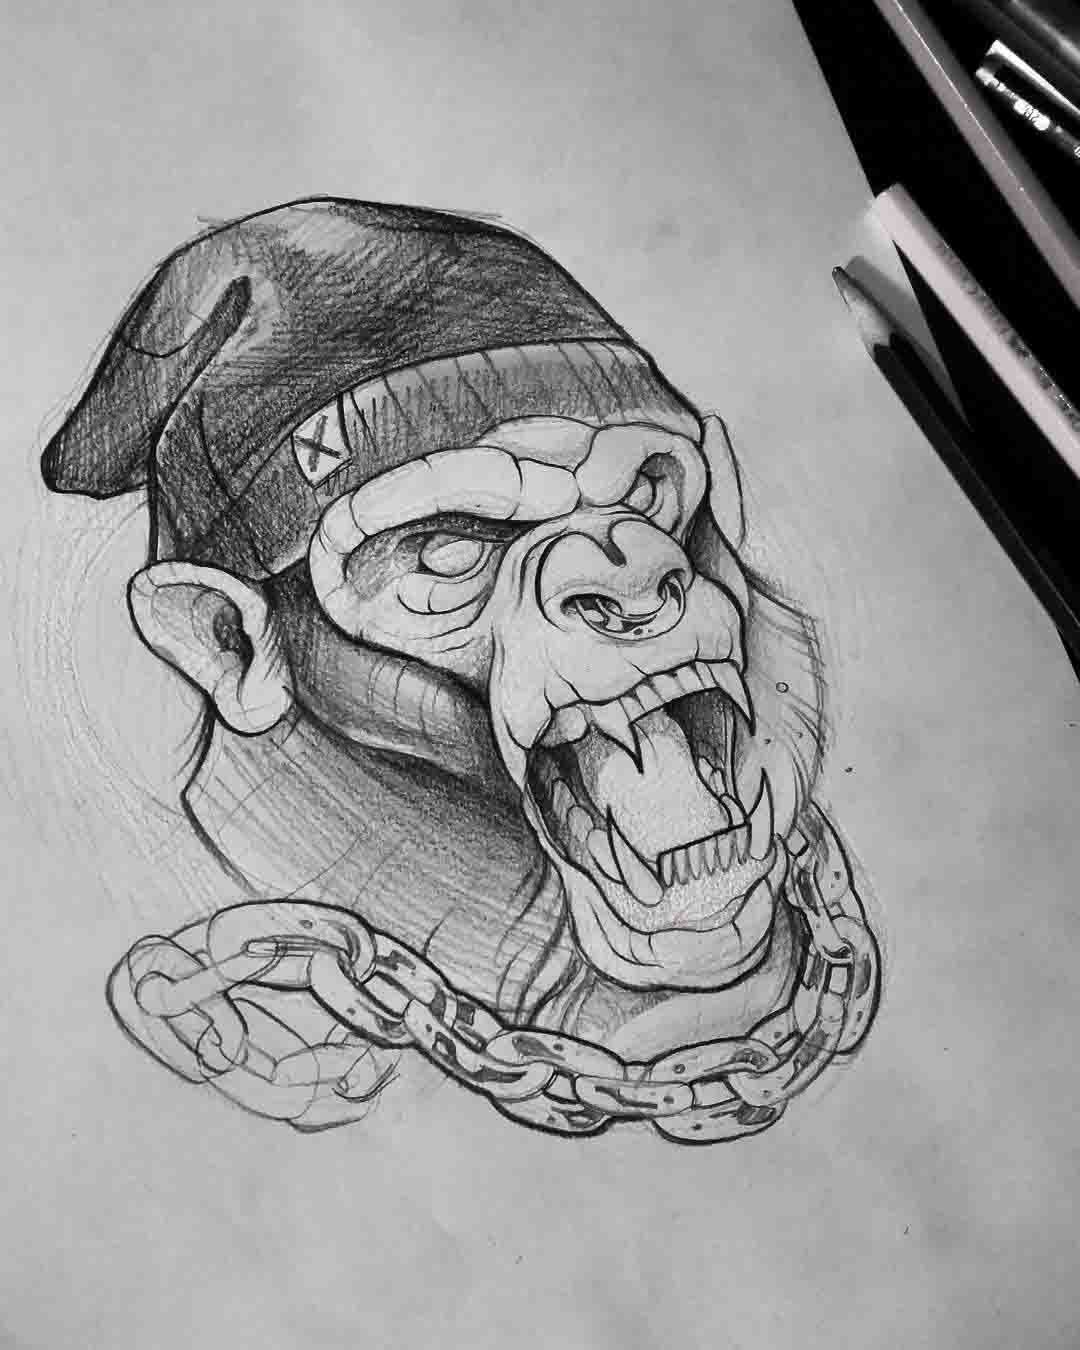 Angry monkey tattoo idea verrückten tattoos sleeve tattoos body art tattoos pencil drawings